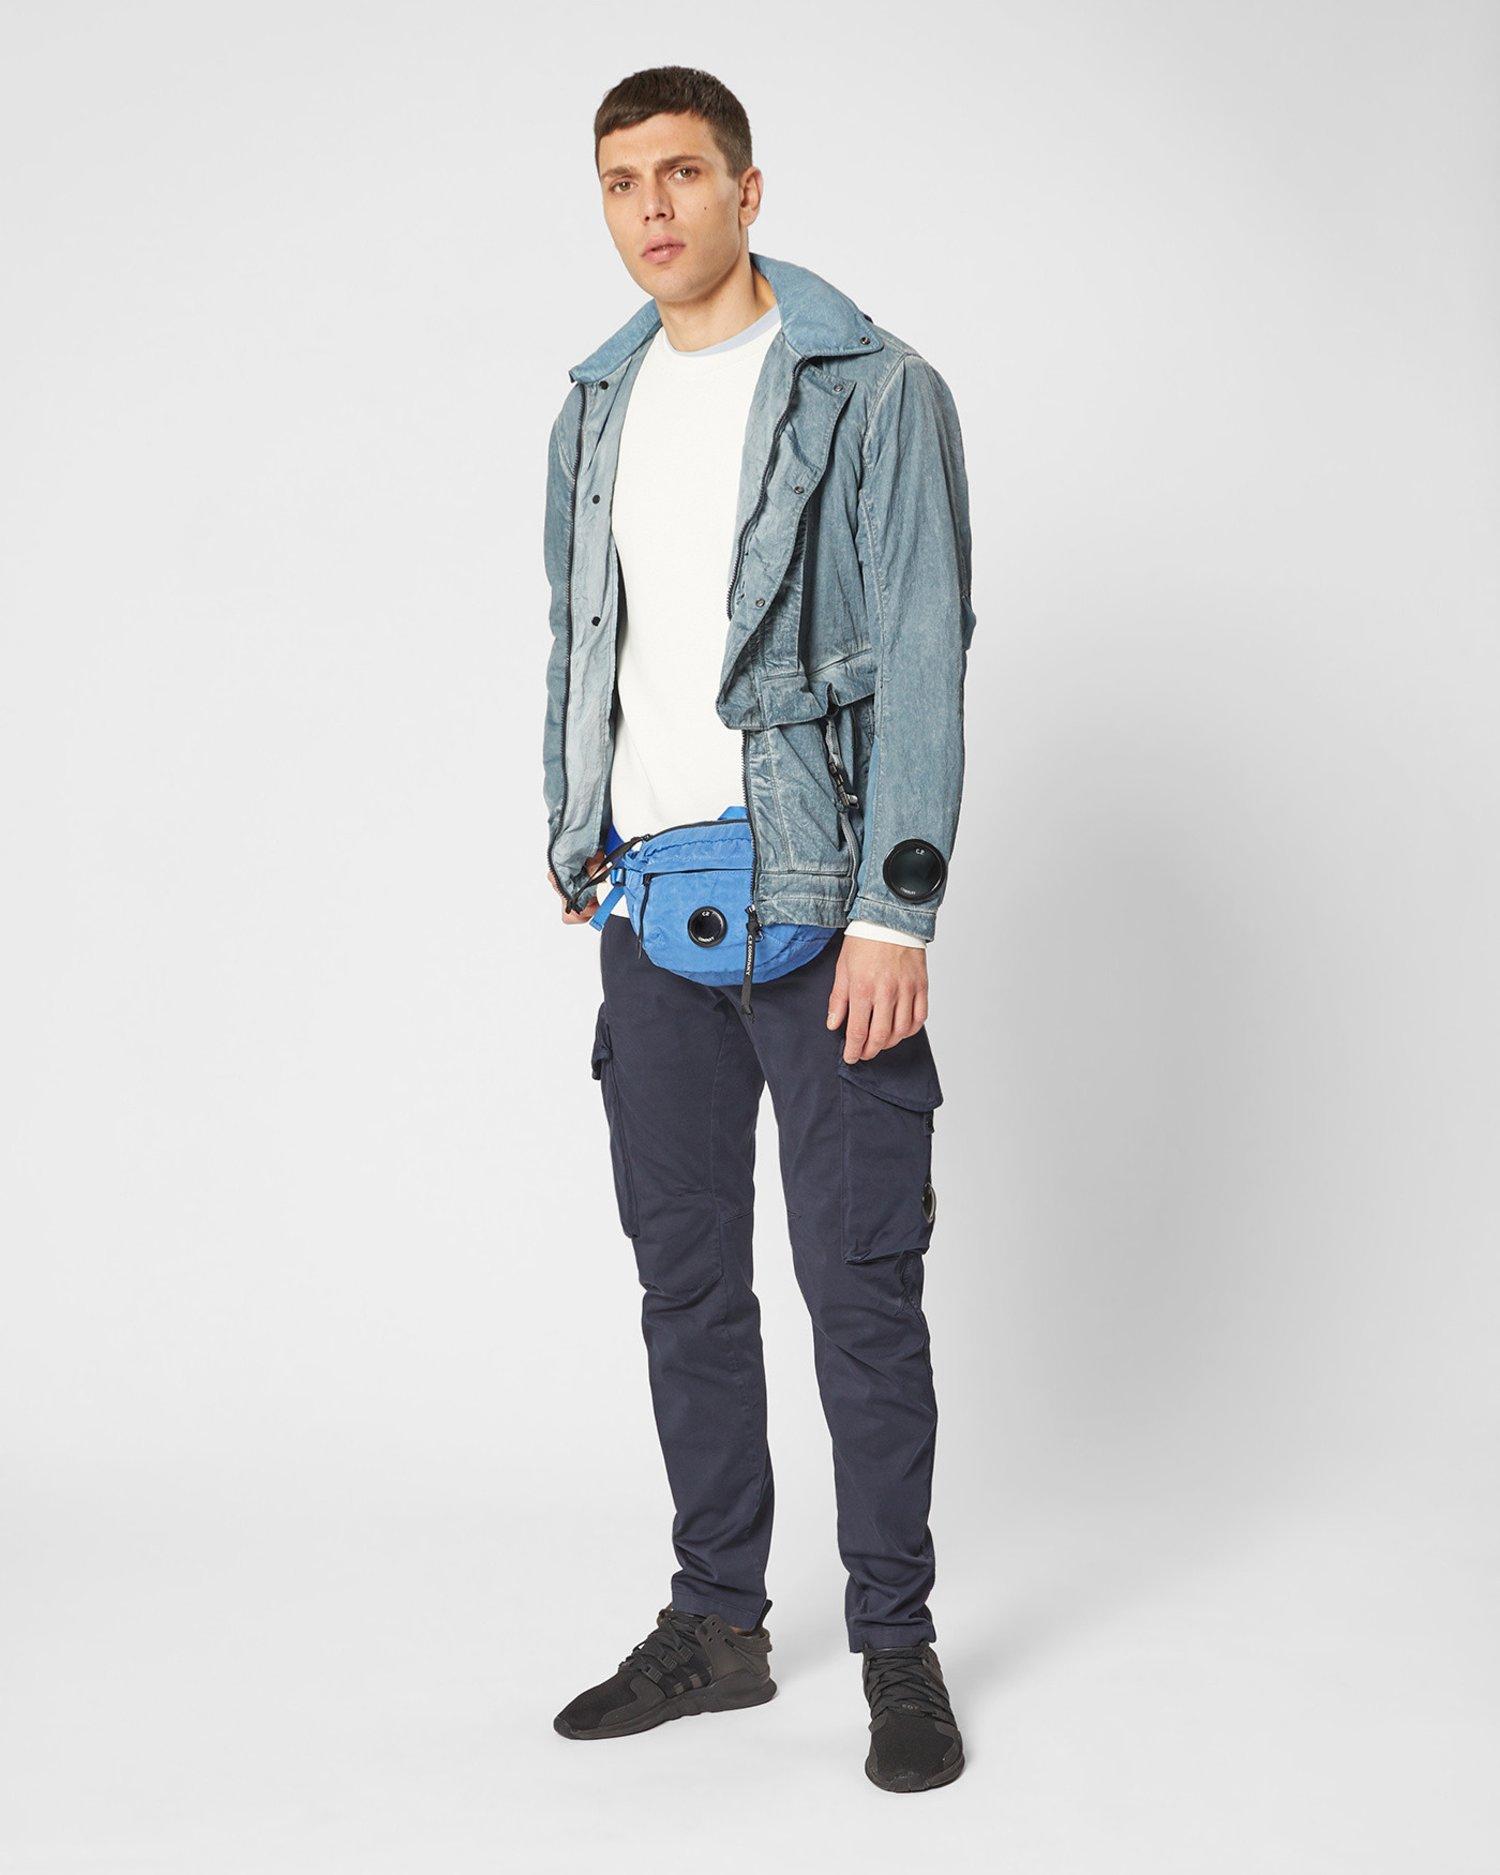 M.T.t.N Goggle Jacket